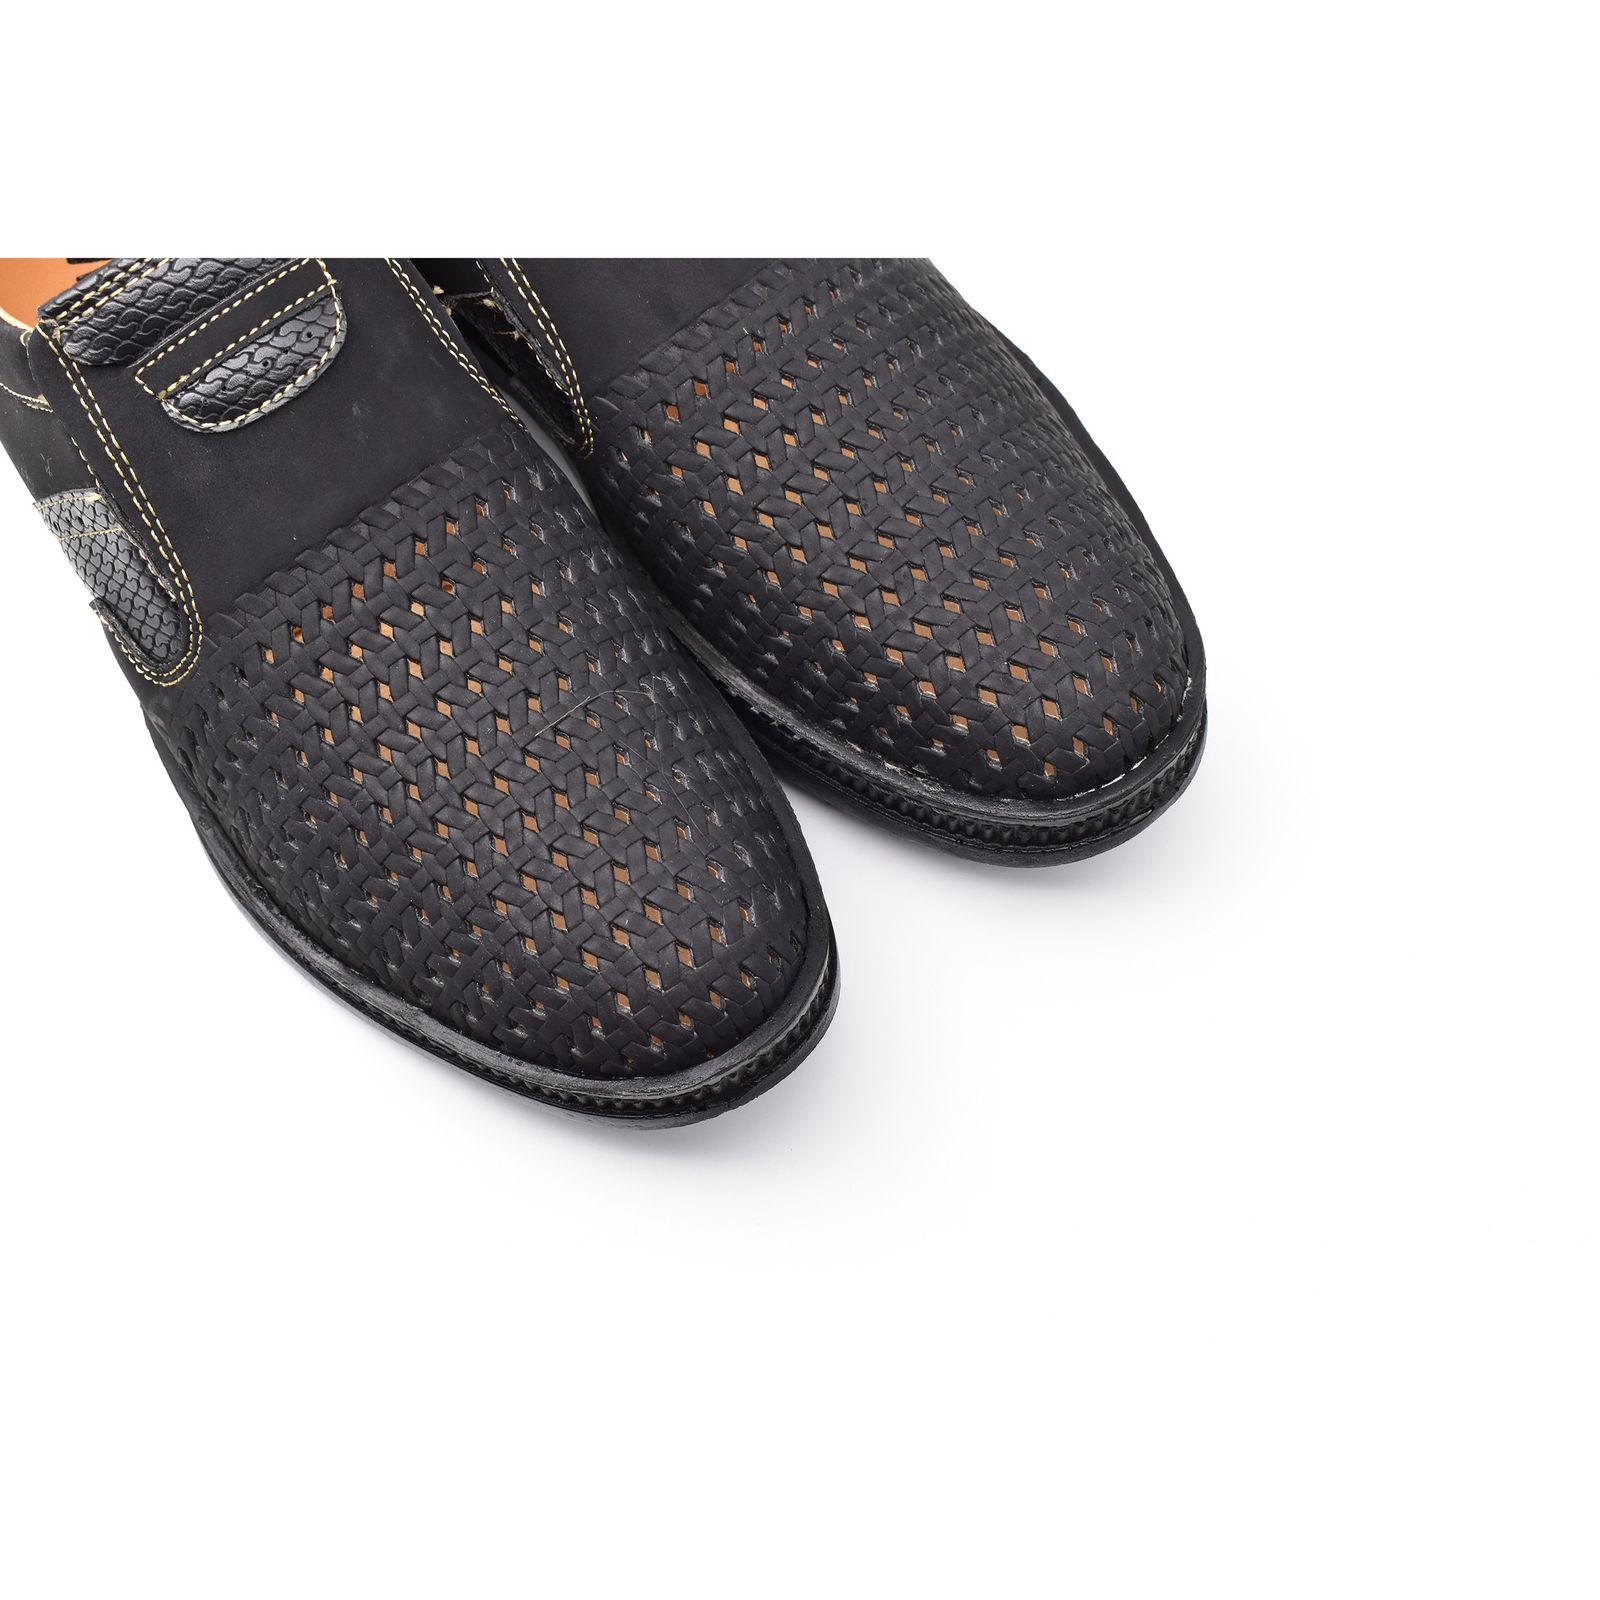 کفش روزمره مردانه مدل گلف کد 7014 -  - 3